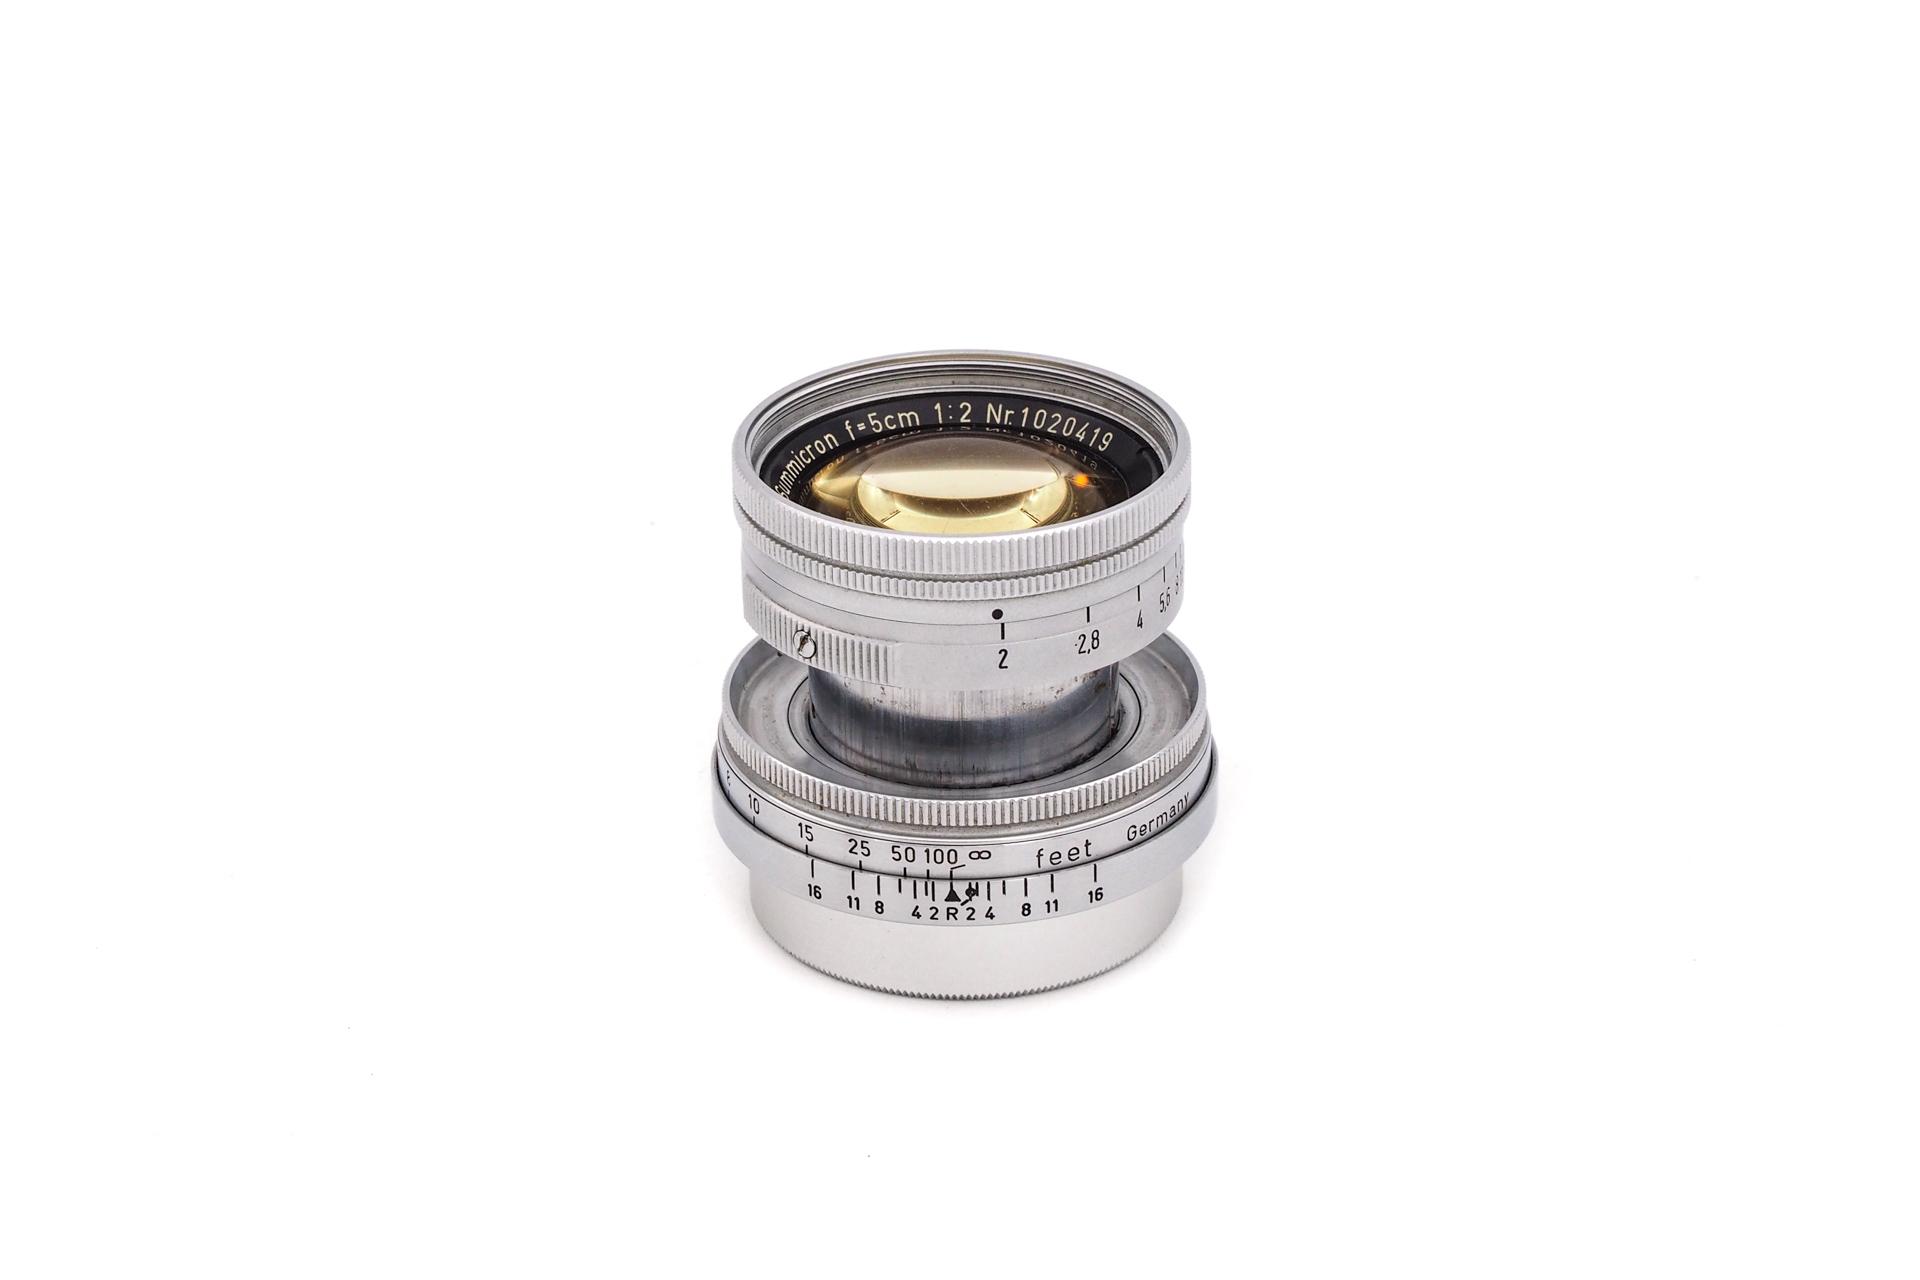 Leica Summicron 1:2/50mm M39 Radioactive